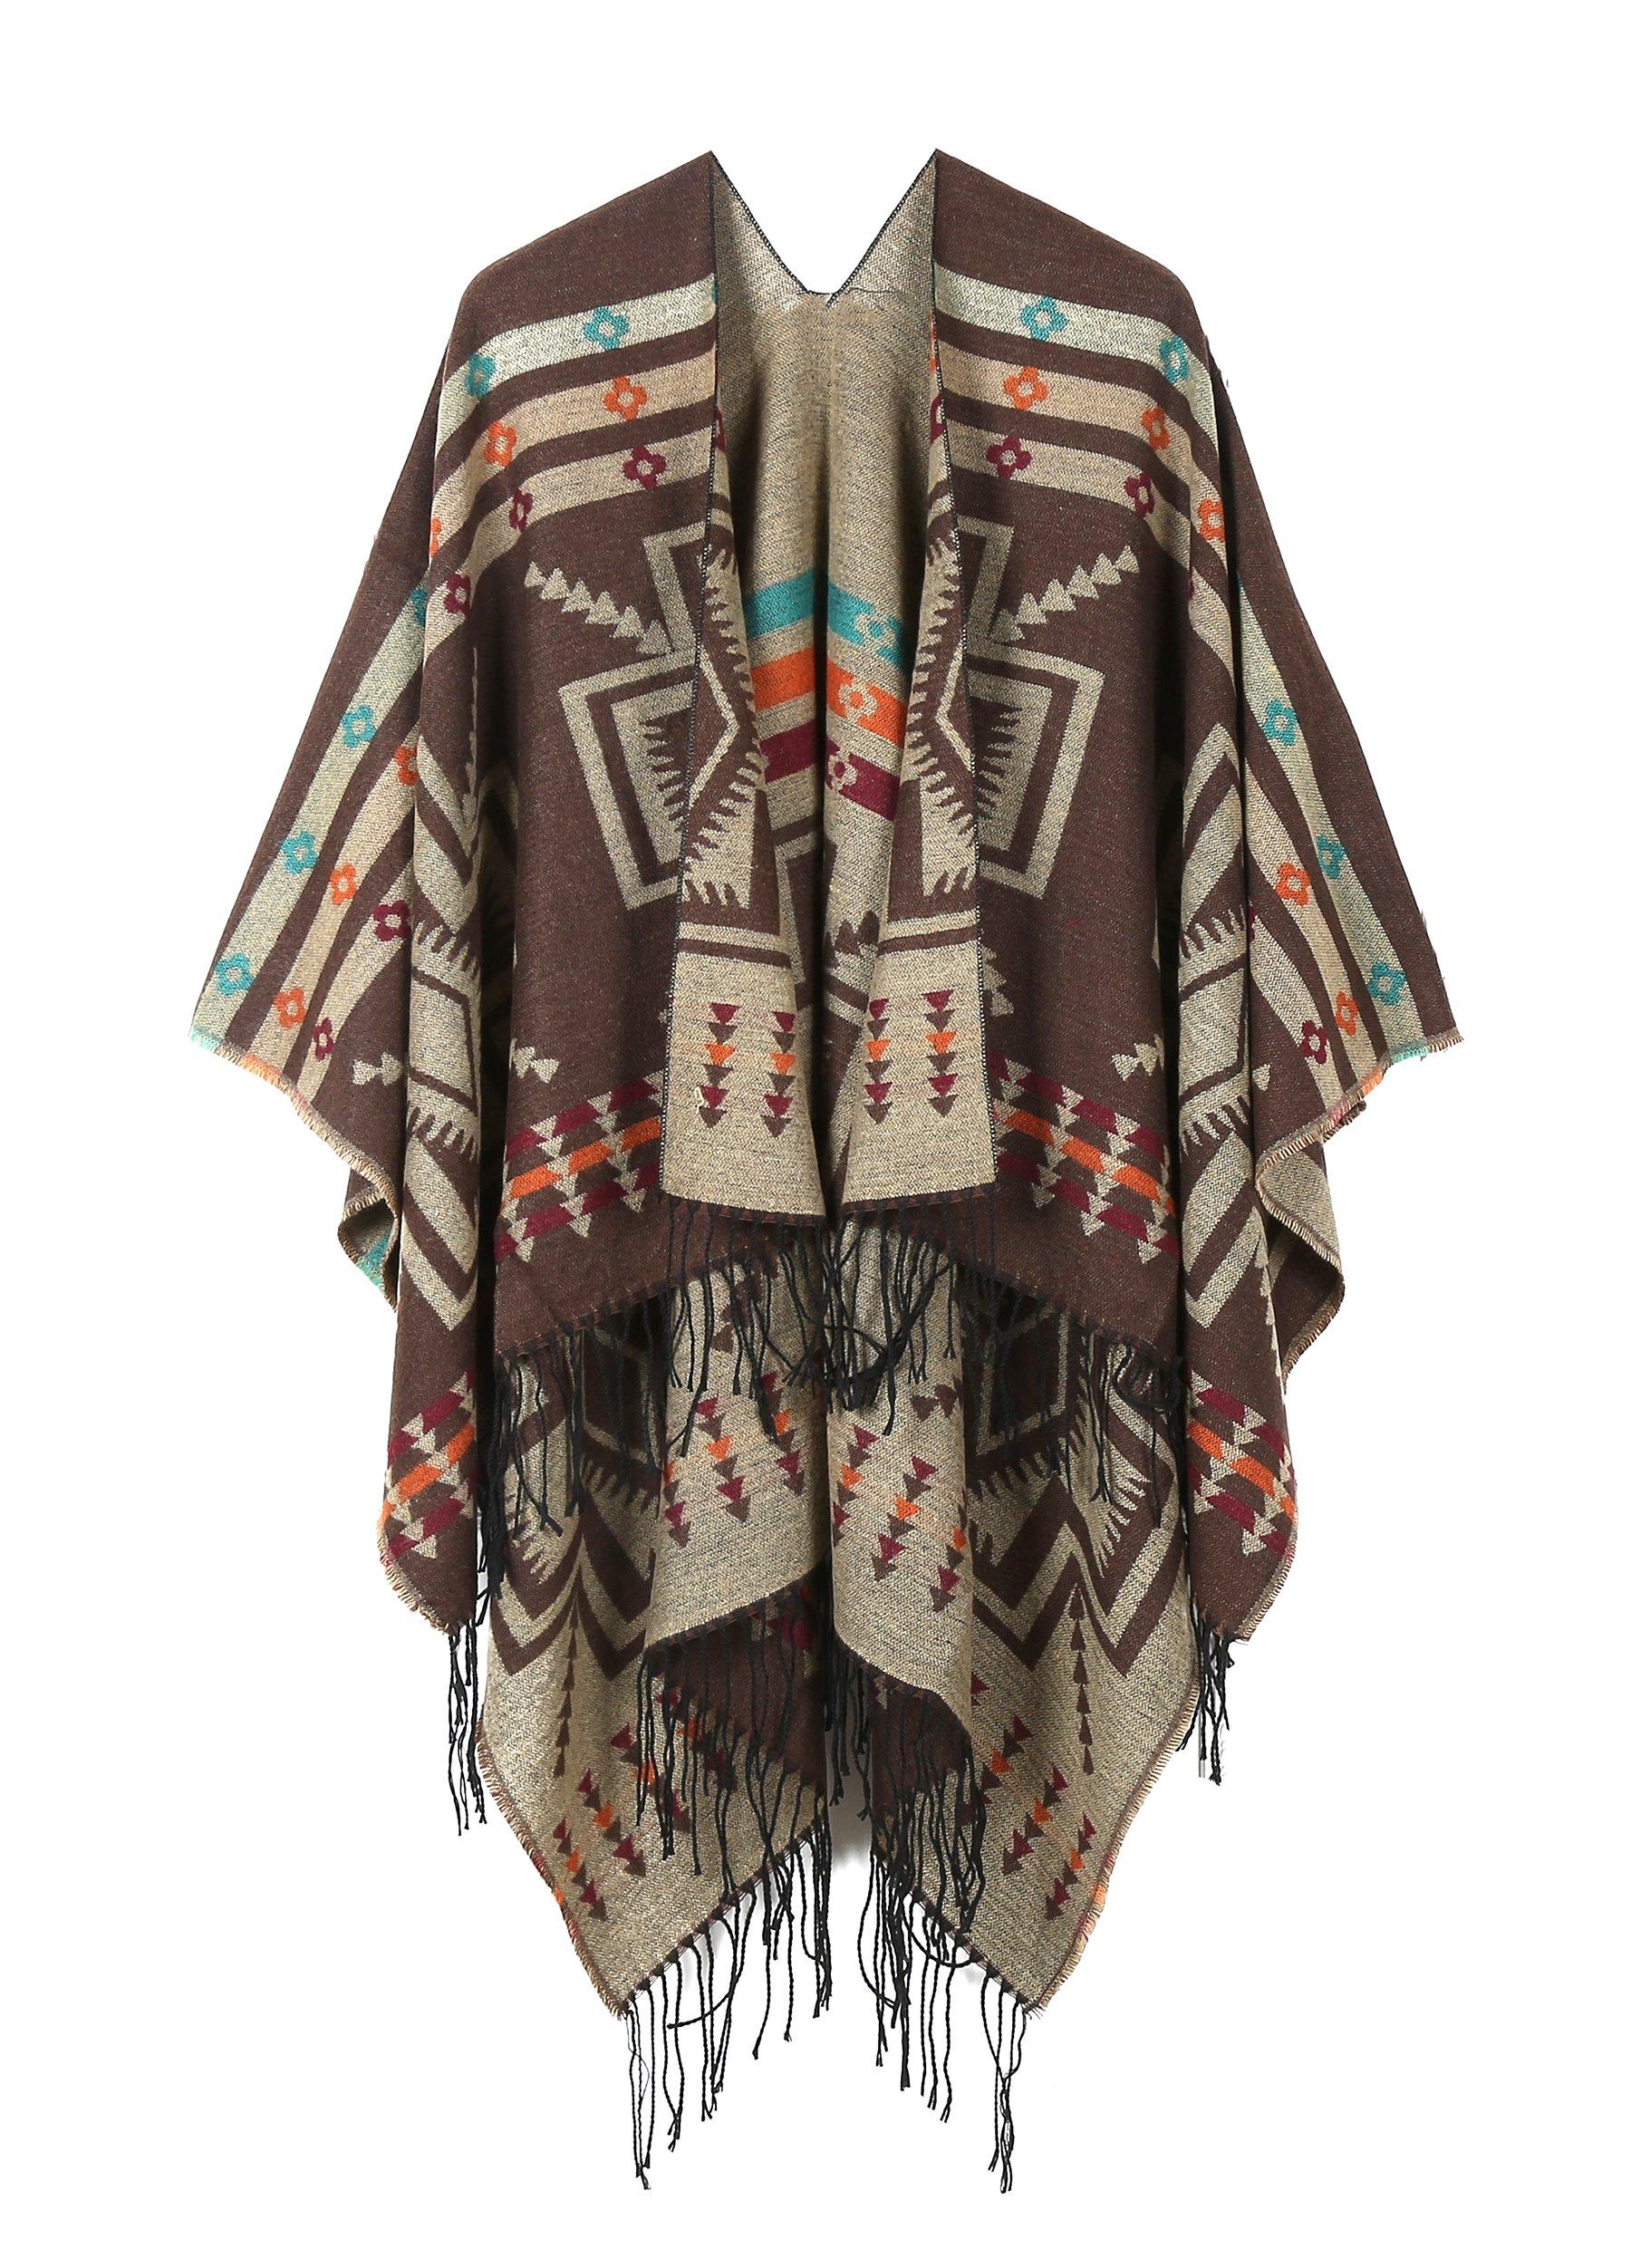 JURUAA Loose Mexican Wool Poncho Shawl Cloaks Cape Wrap Kimono Cardigans Coffee